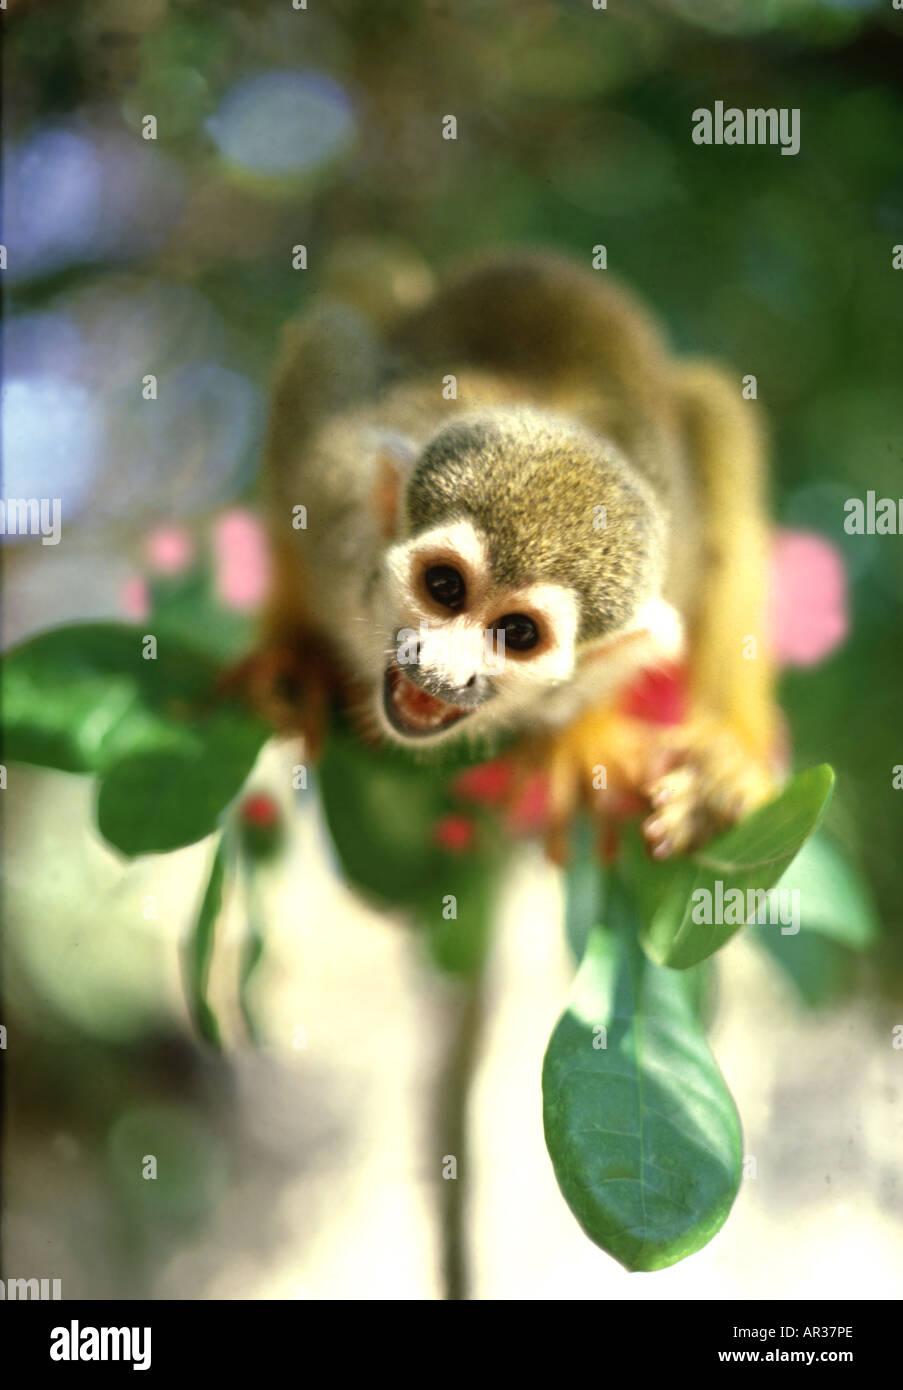 Squirrel monkey in Amazonia, Amazonia, Brazil South America - Stock Image